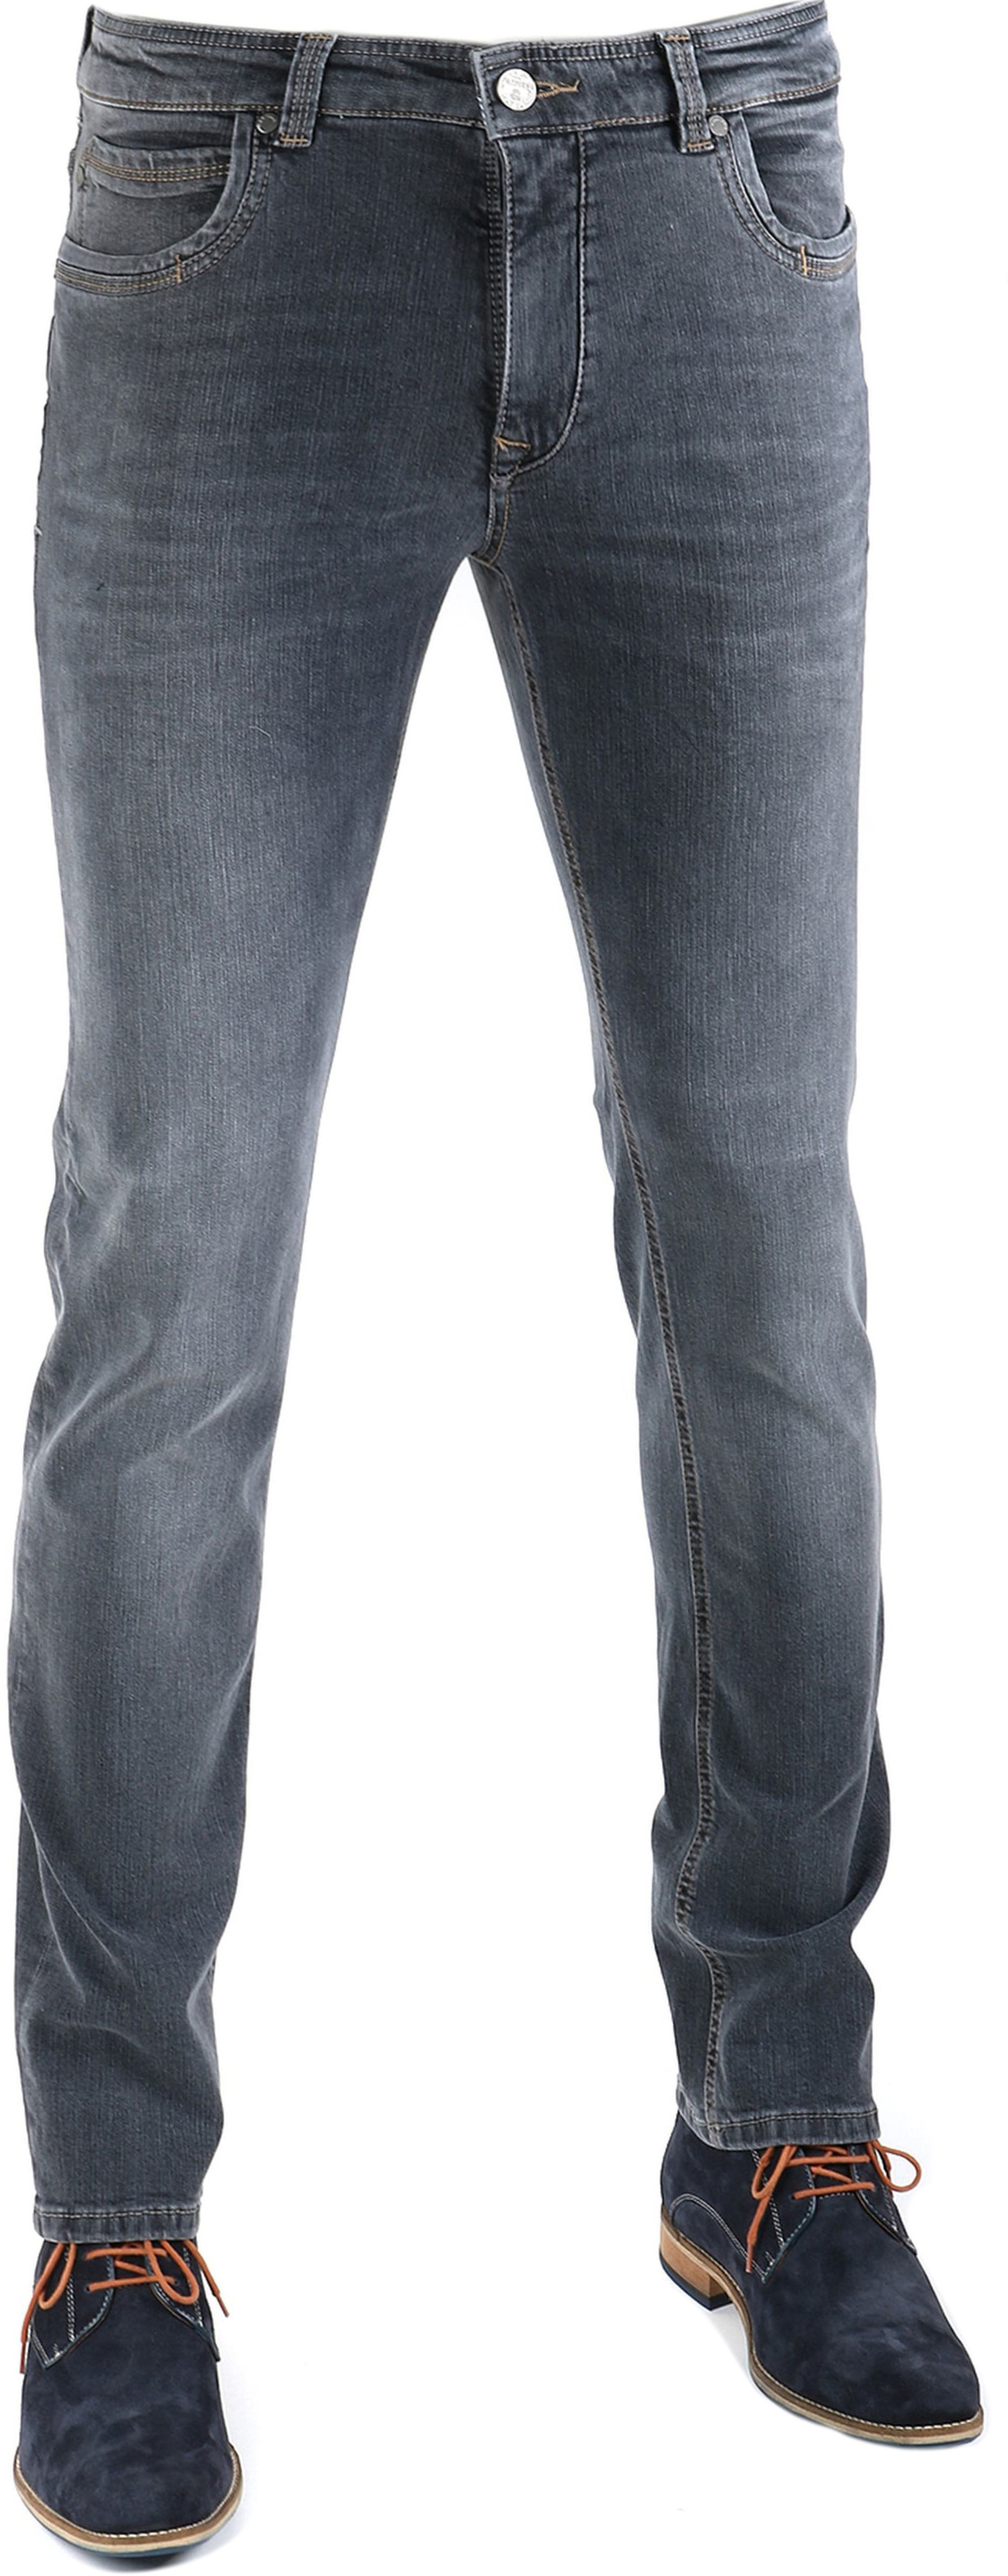 Gardeur Batu Jeans Anthraciet foto 0